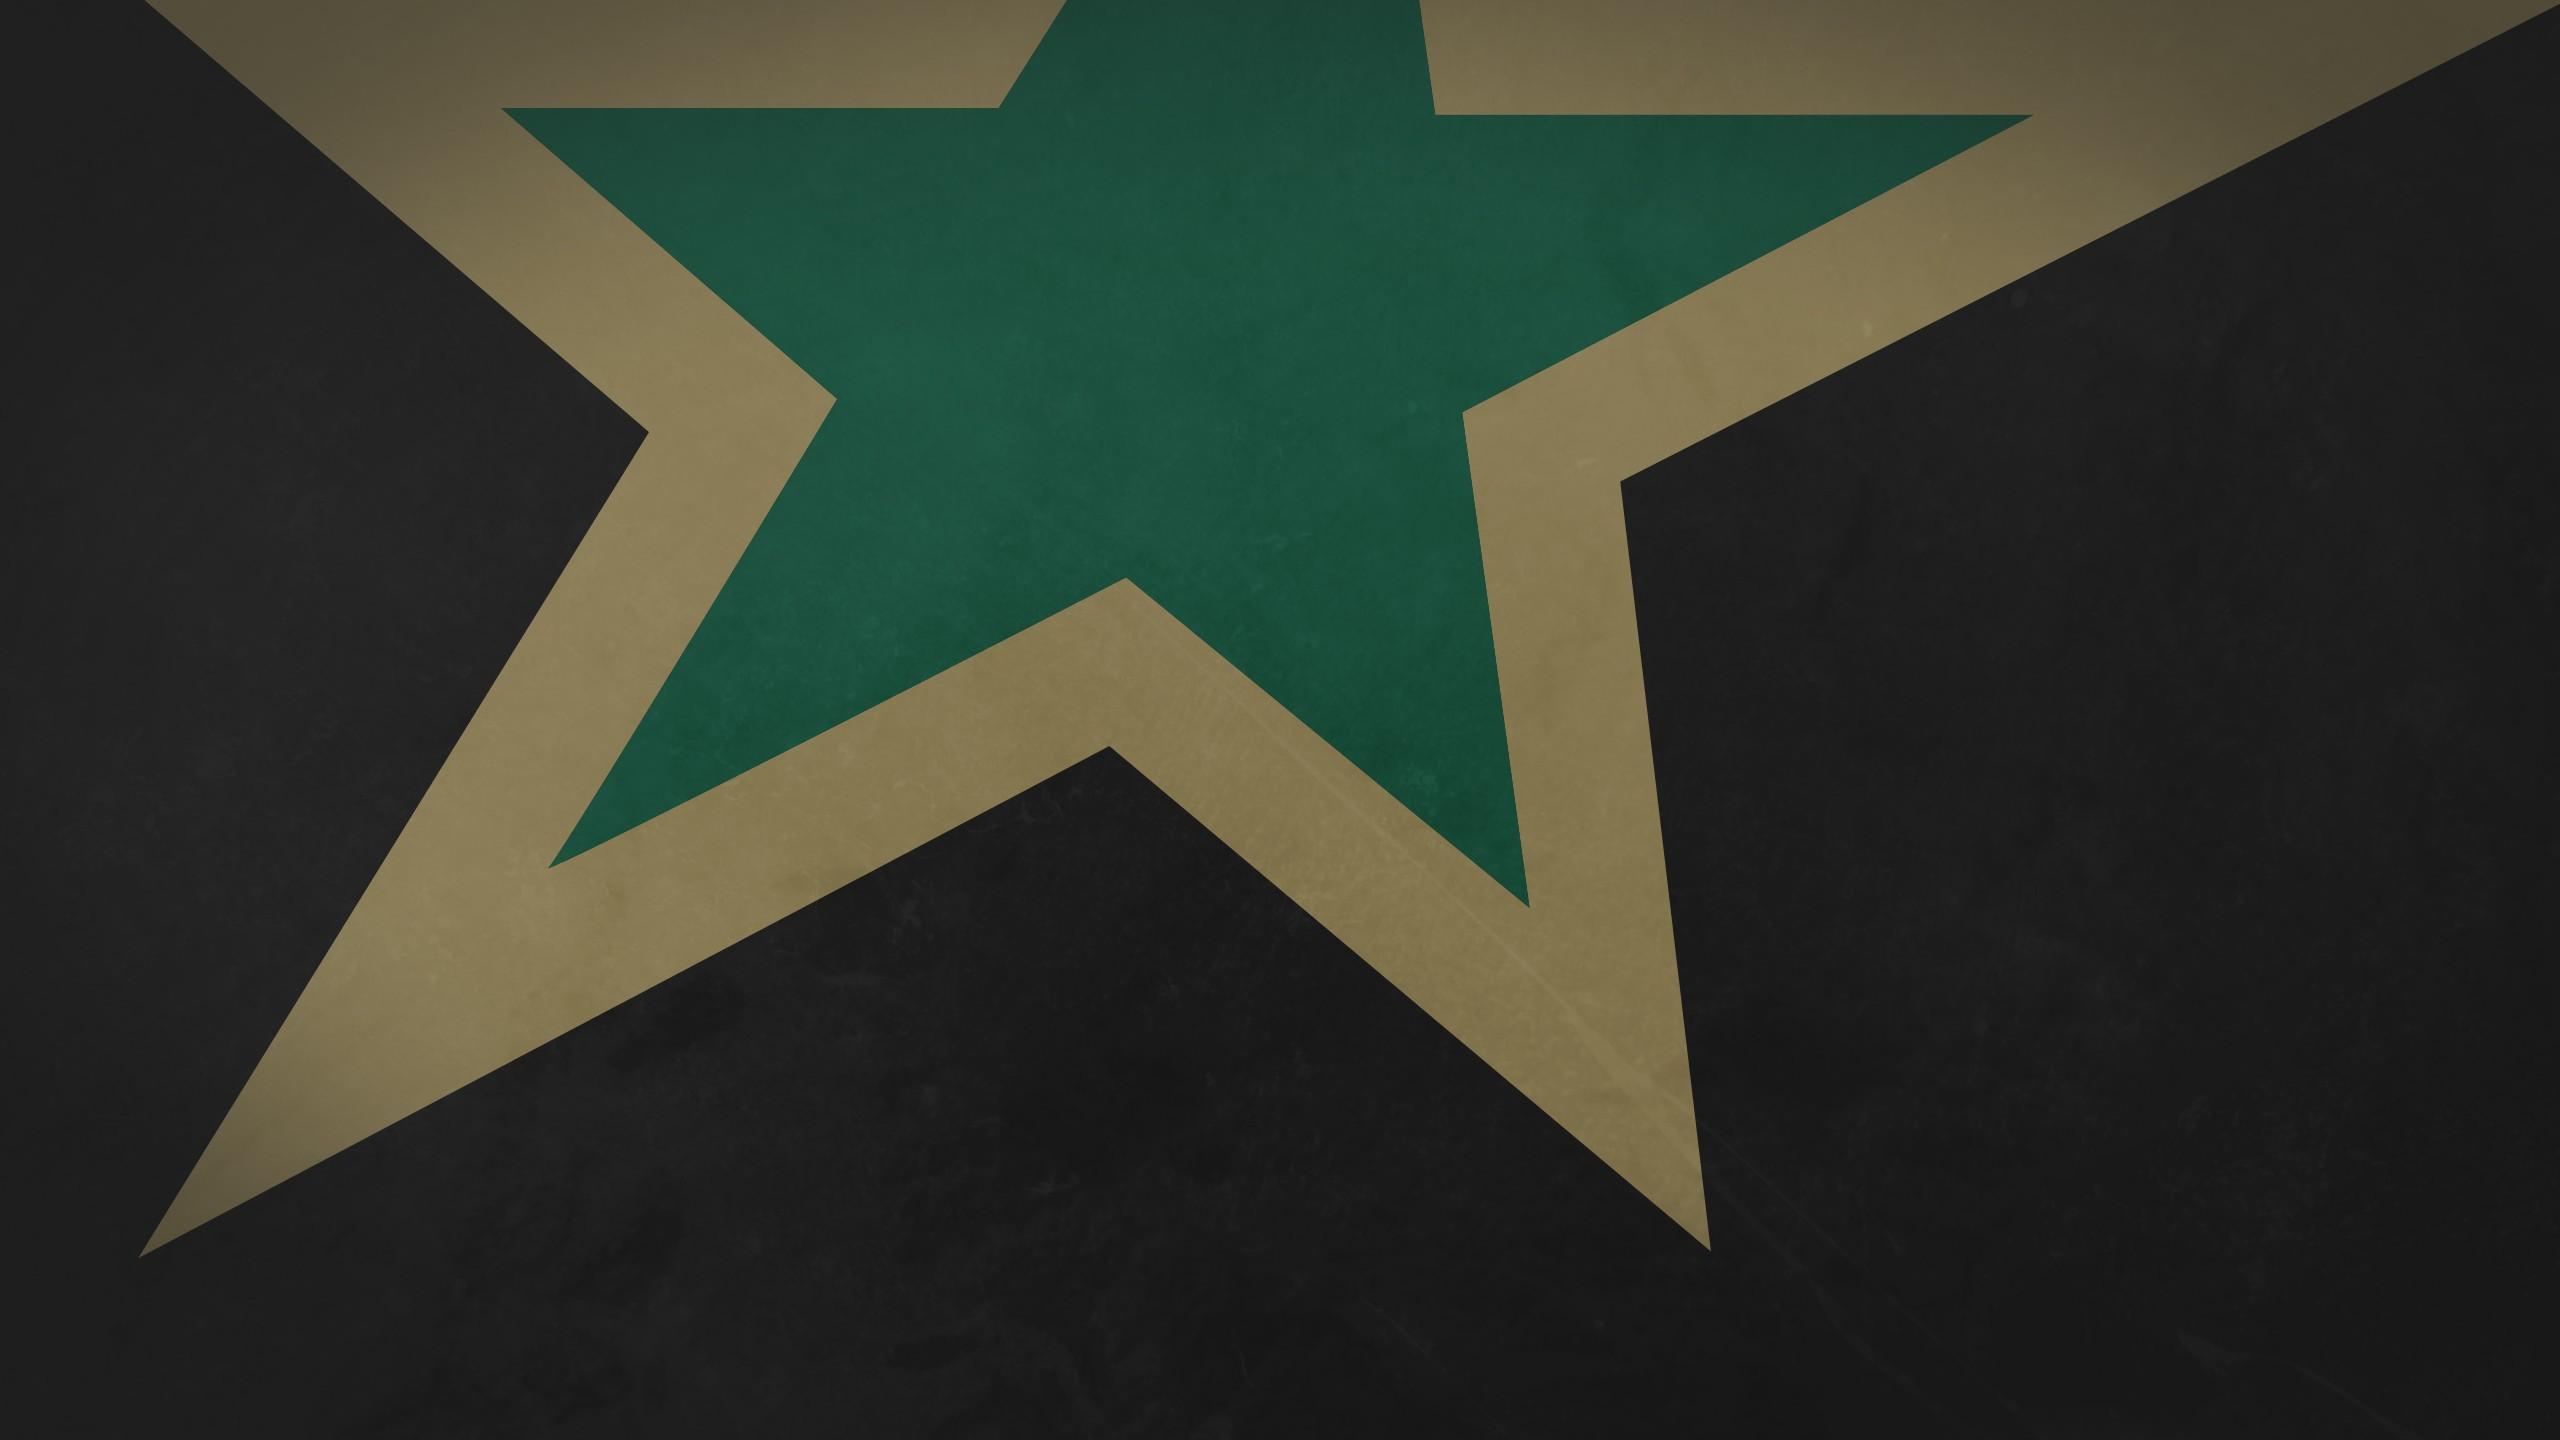 Dallas Stars Wallpaper Iphone Dallas Stars Full Hd Wallpaper And Background Image